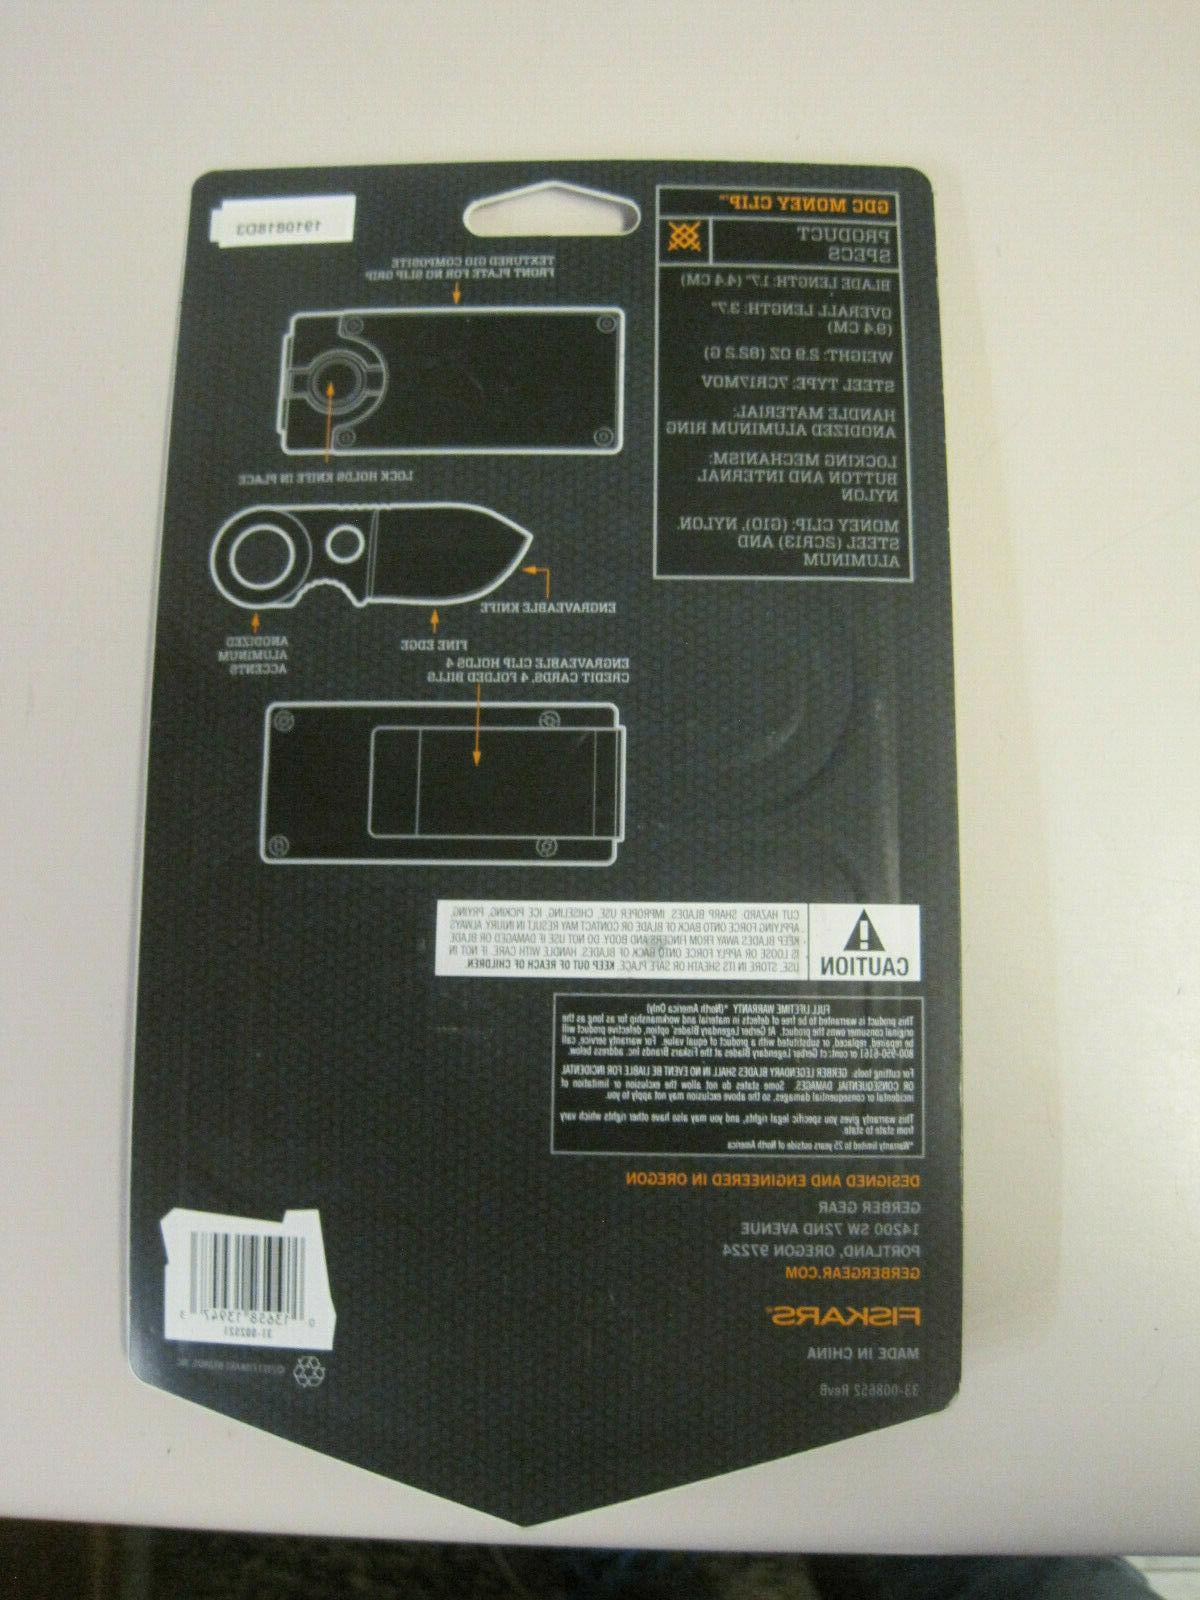 Gerber GDC model 31-002521, new in package